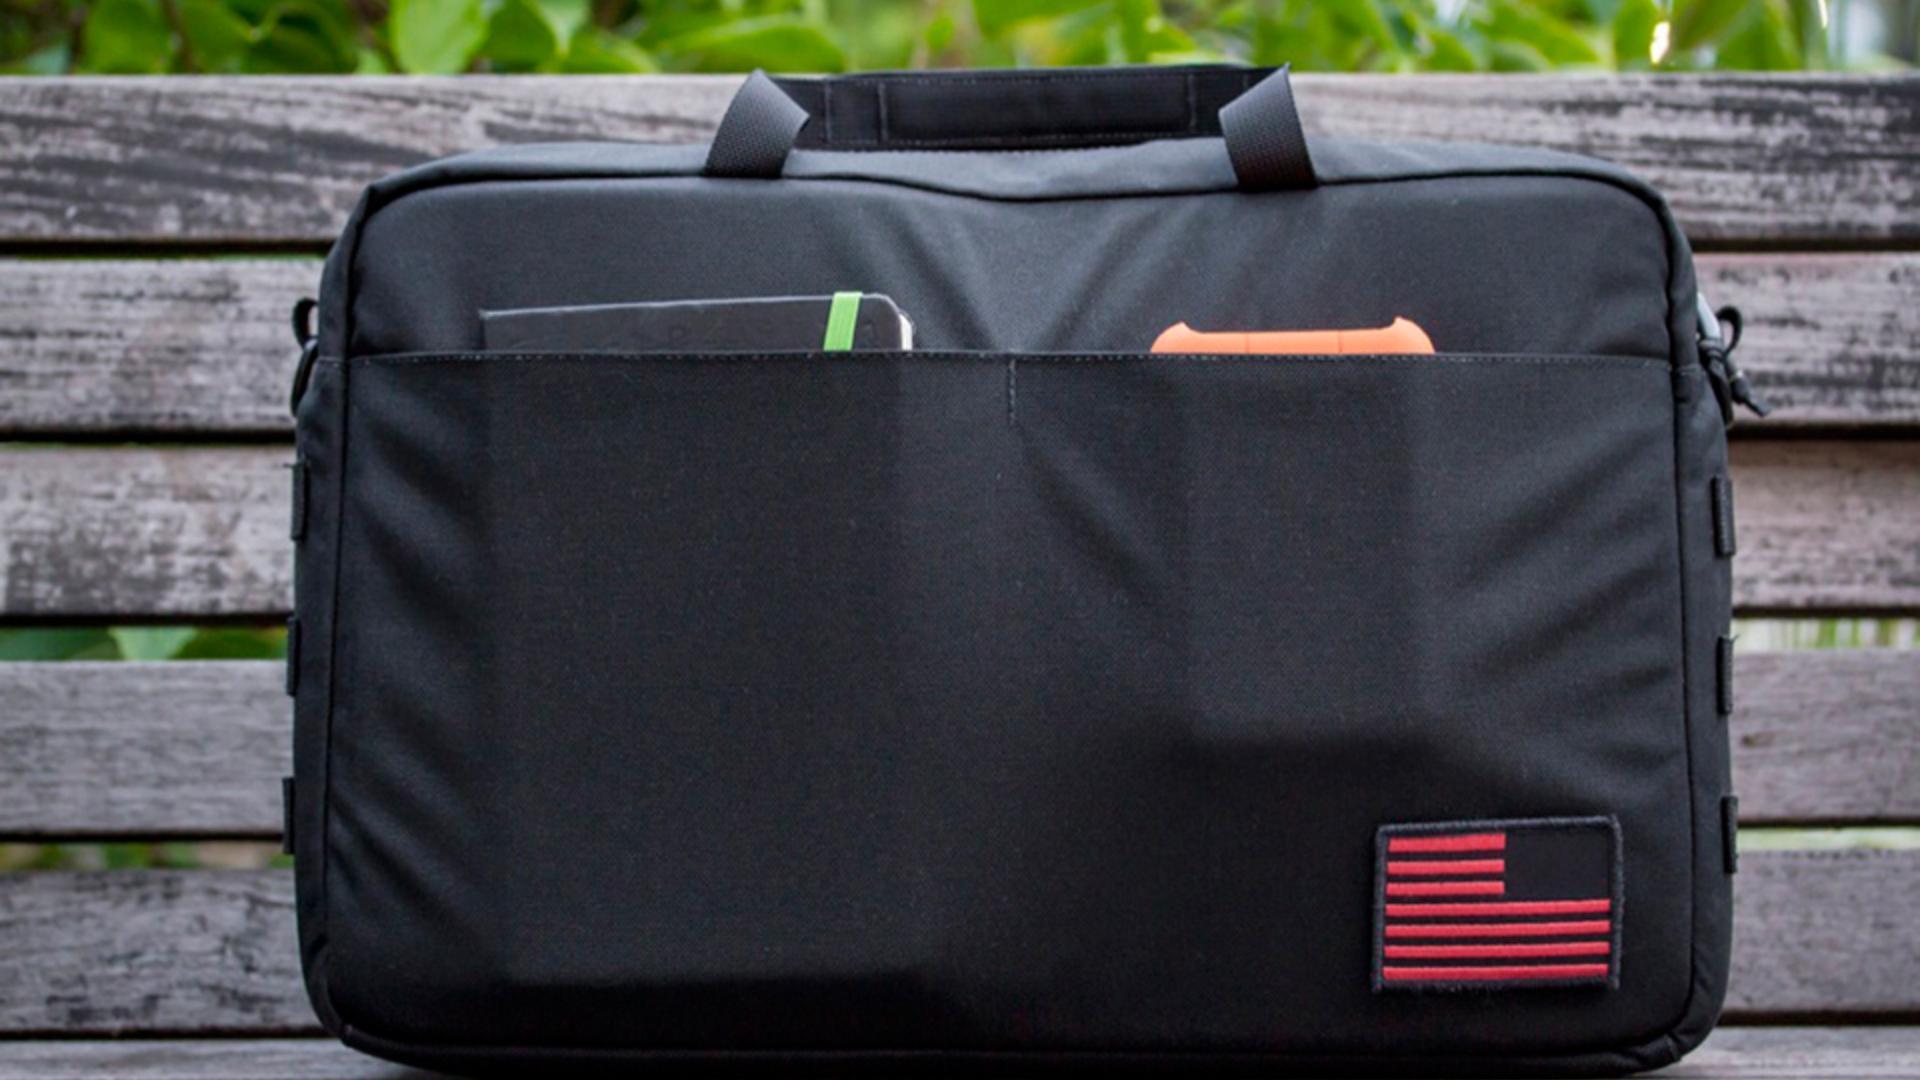 Goruck Bombproof Bag